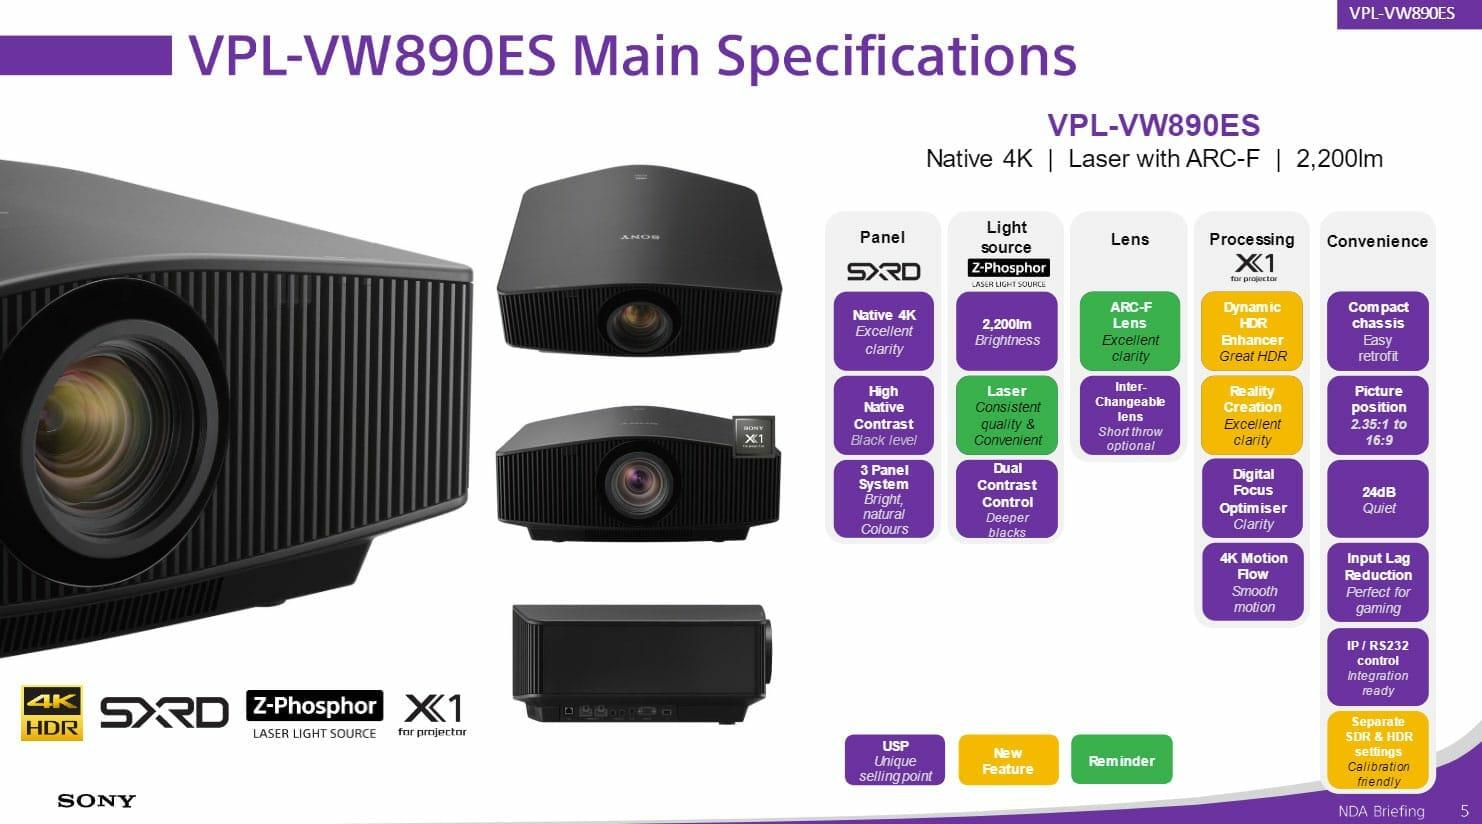 features-vpl-vw890es_sony.jpg